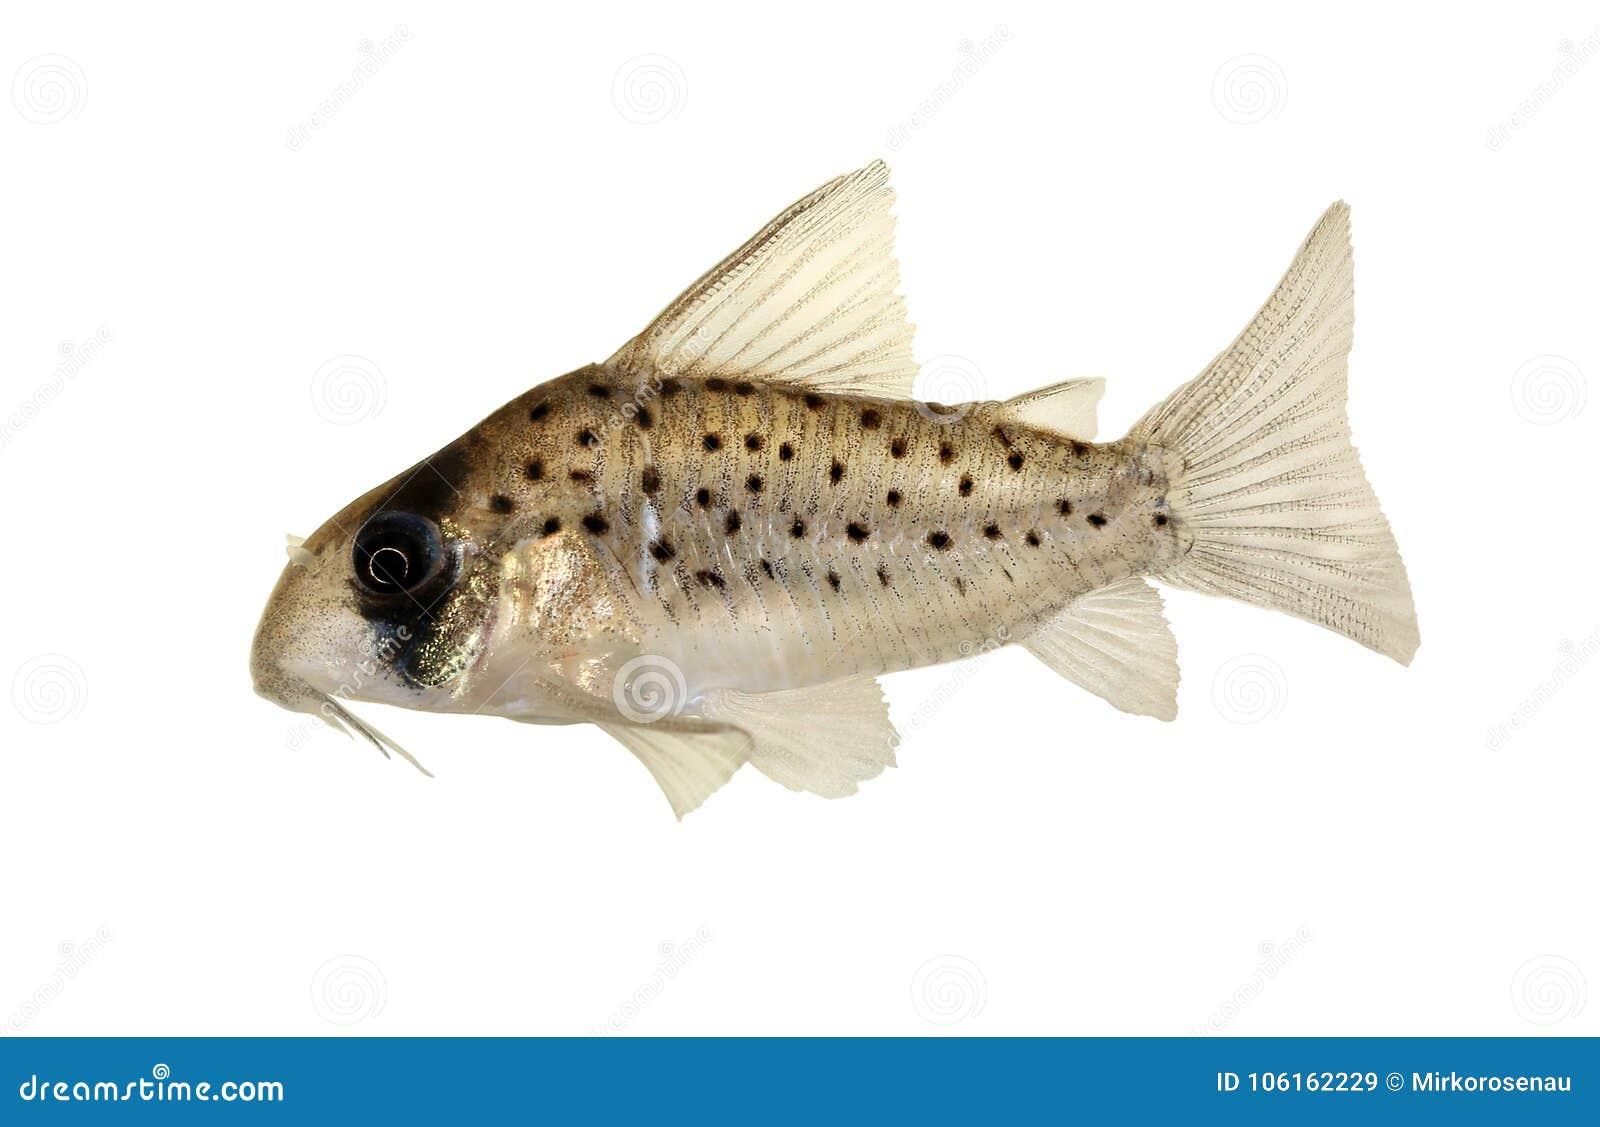 Atropersonatus Feen-Cory Dotteds cory Corydoras Aquariumfische